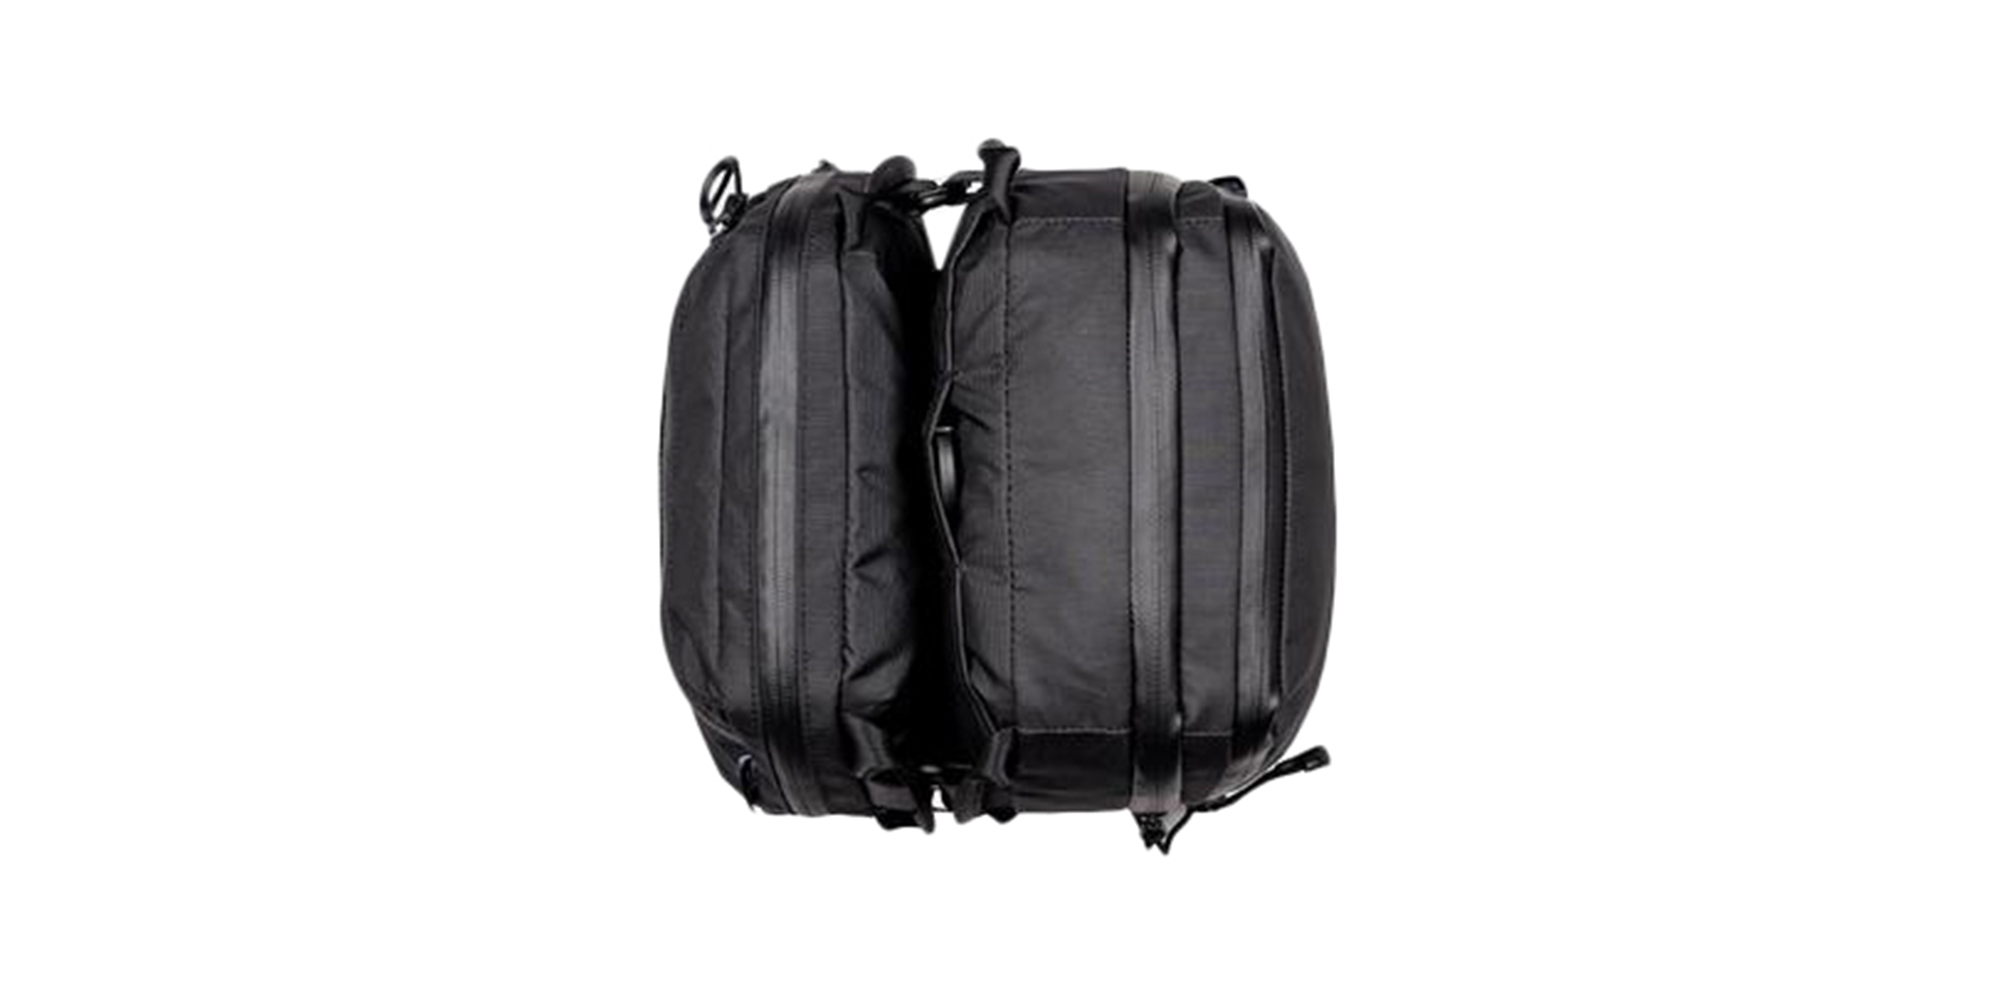 Wandrd Toiletry Bag Medium and Large